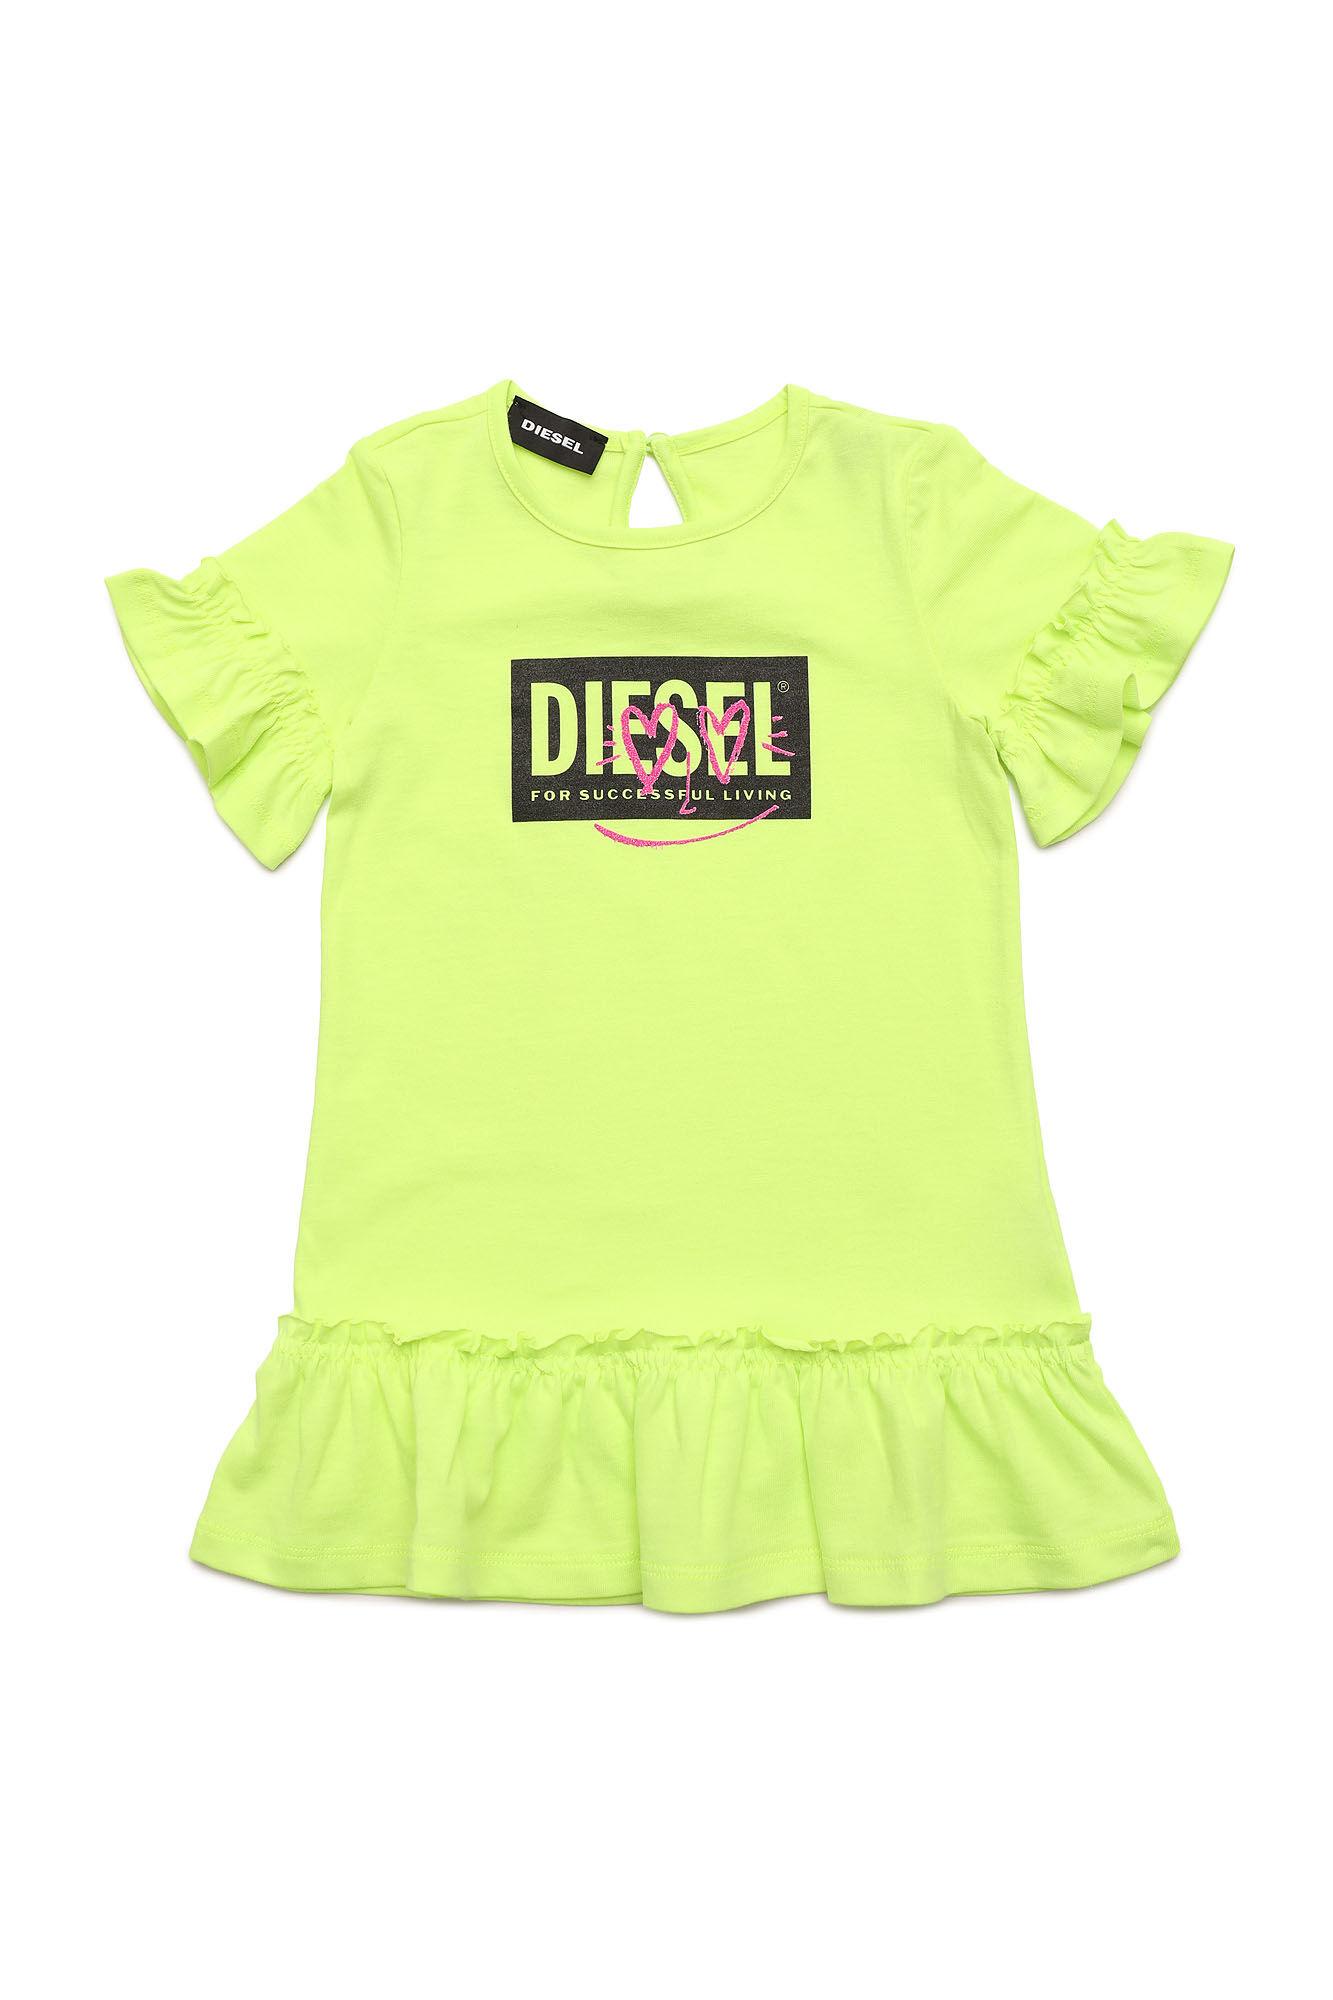 Danilab Abito - Diesel Kid